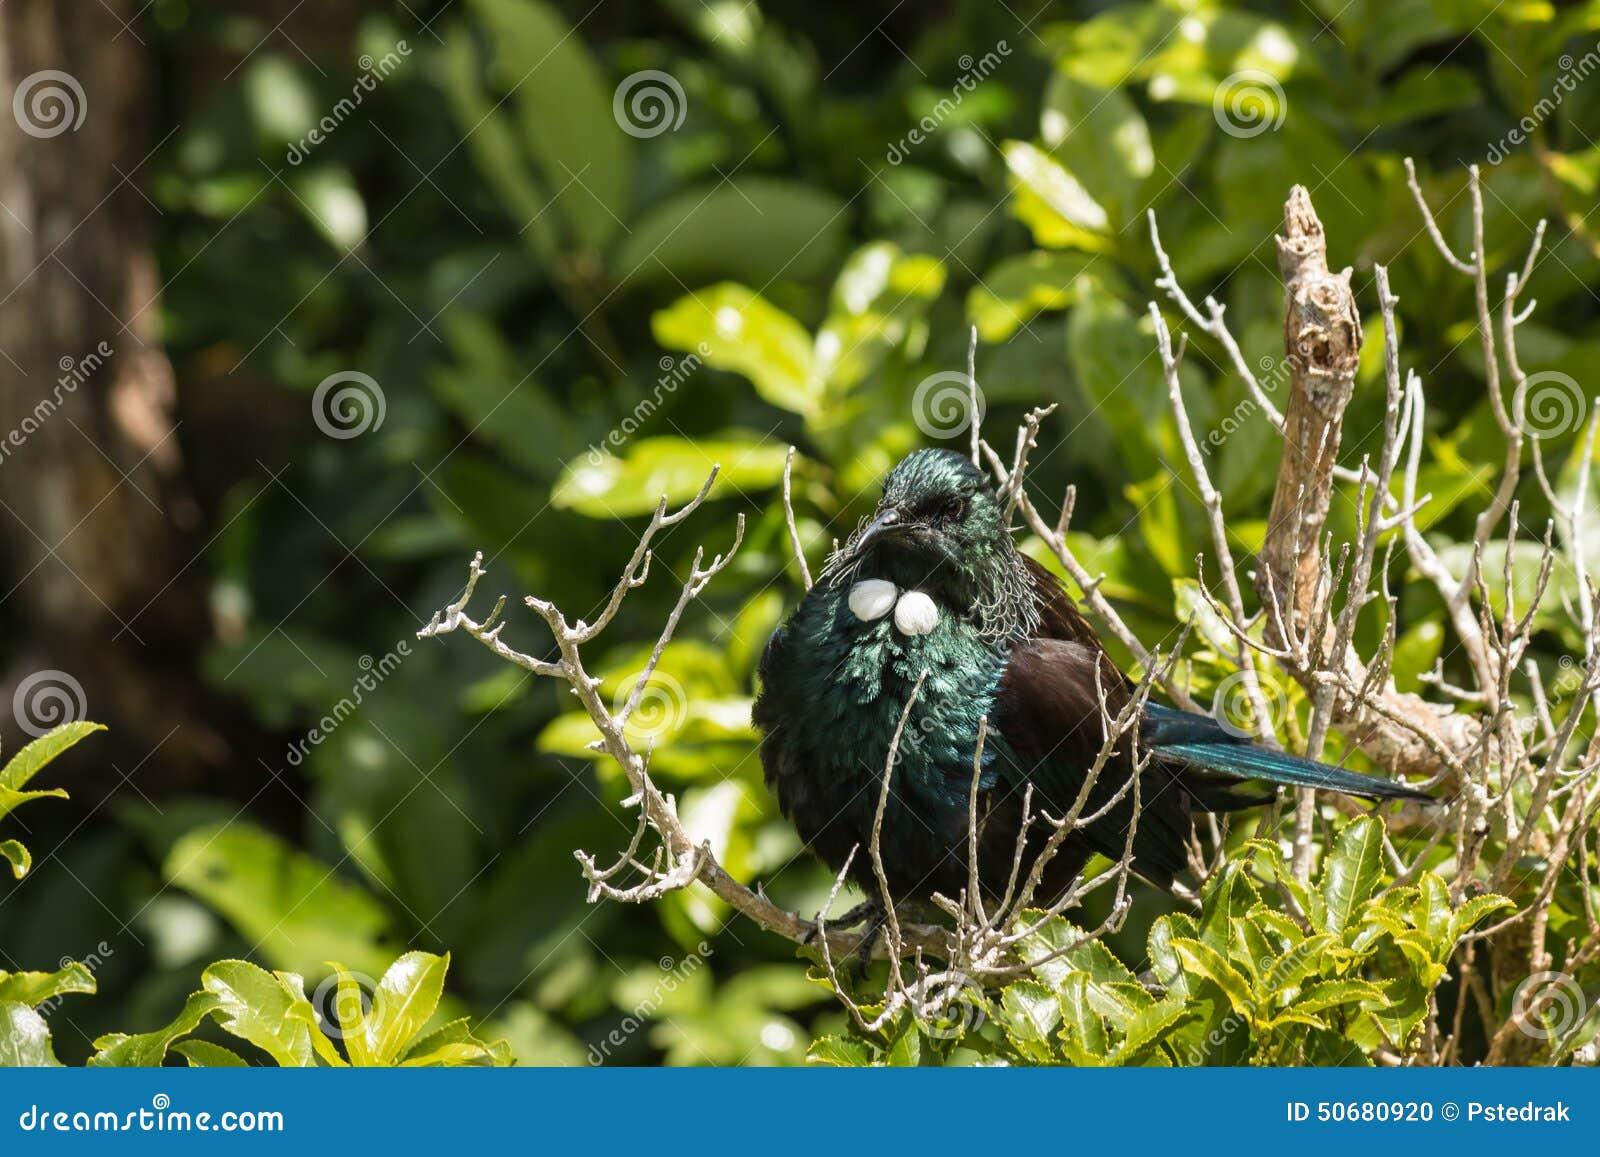 Download 取暖的tui鸟 库存照片. 图片 包括有 查出, 黑板, 呈虹彩, brander, 西兰, 结构树, 异乎寻常 - 50680920